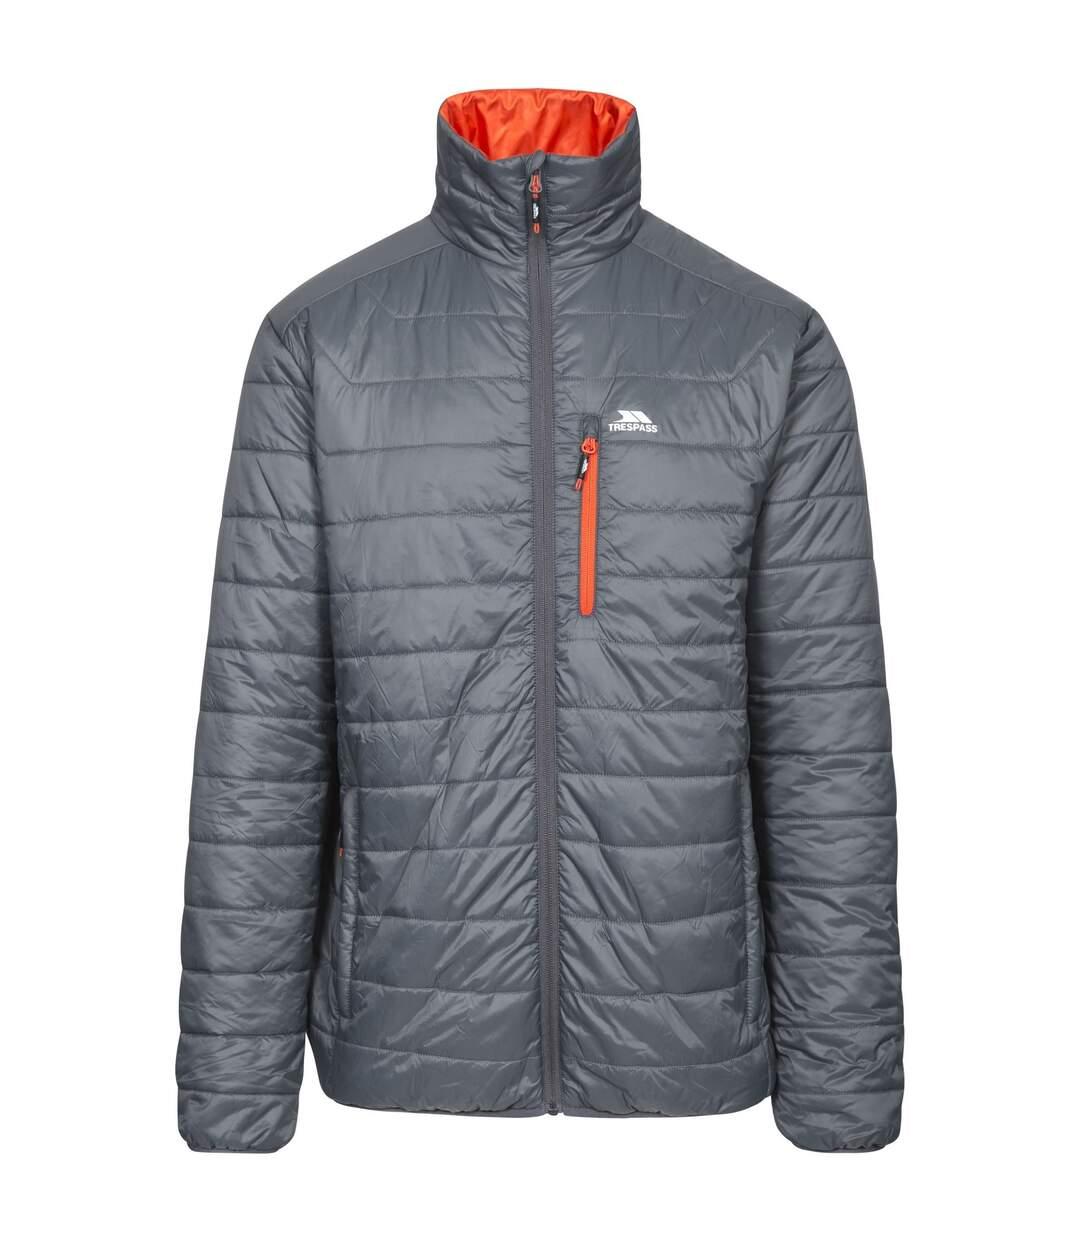 Trespass Mens Norman Padded Jacket (Carbon) - UTTP4284